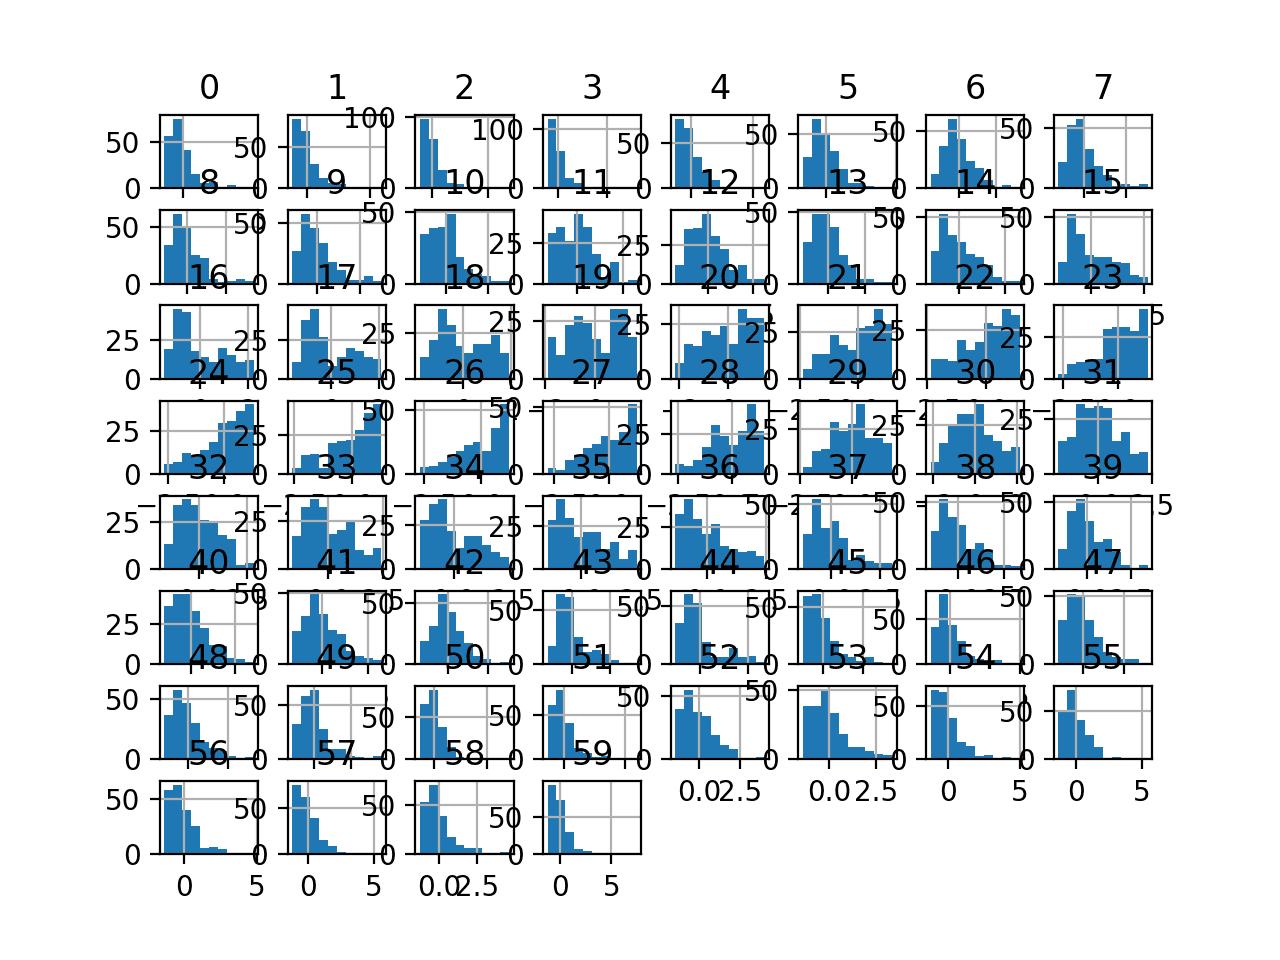 Histogram Plots of StandardScaler Transformed Input Variables for the Sonar Dataset